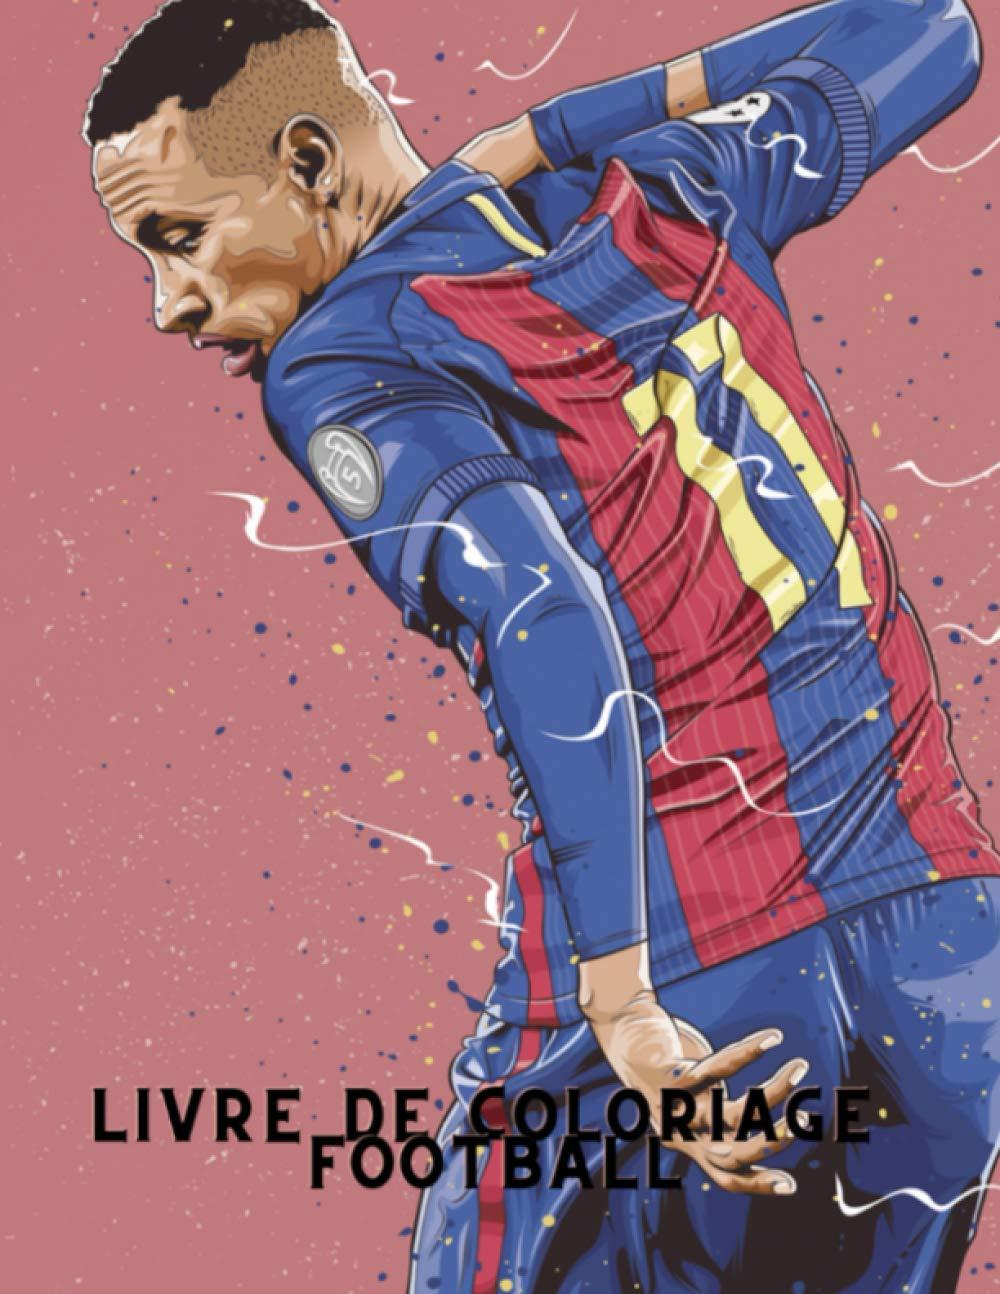 Livre De Coloriage Football Carnet De Coloriage Football 2020 2021 50 Coloriages Pour Tout Age French Edition Football Edition 9798690044954 Amazon Com Books